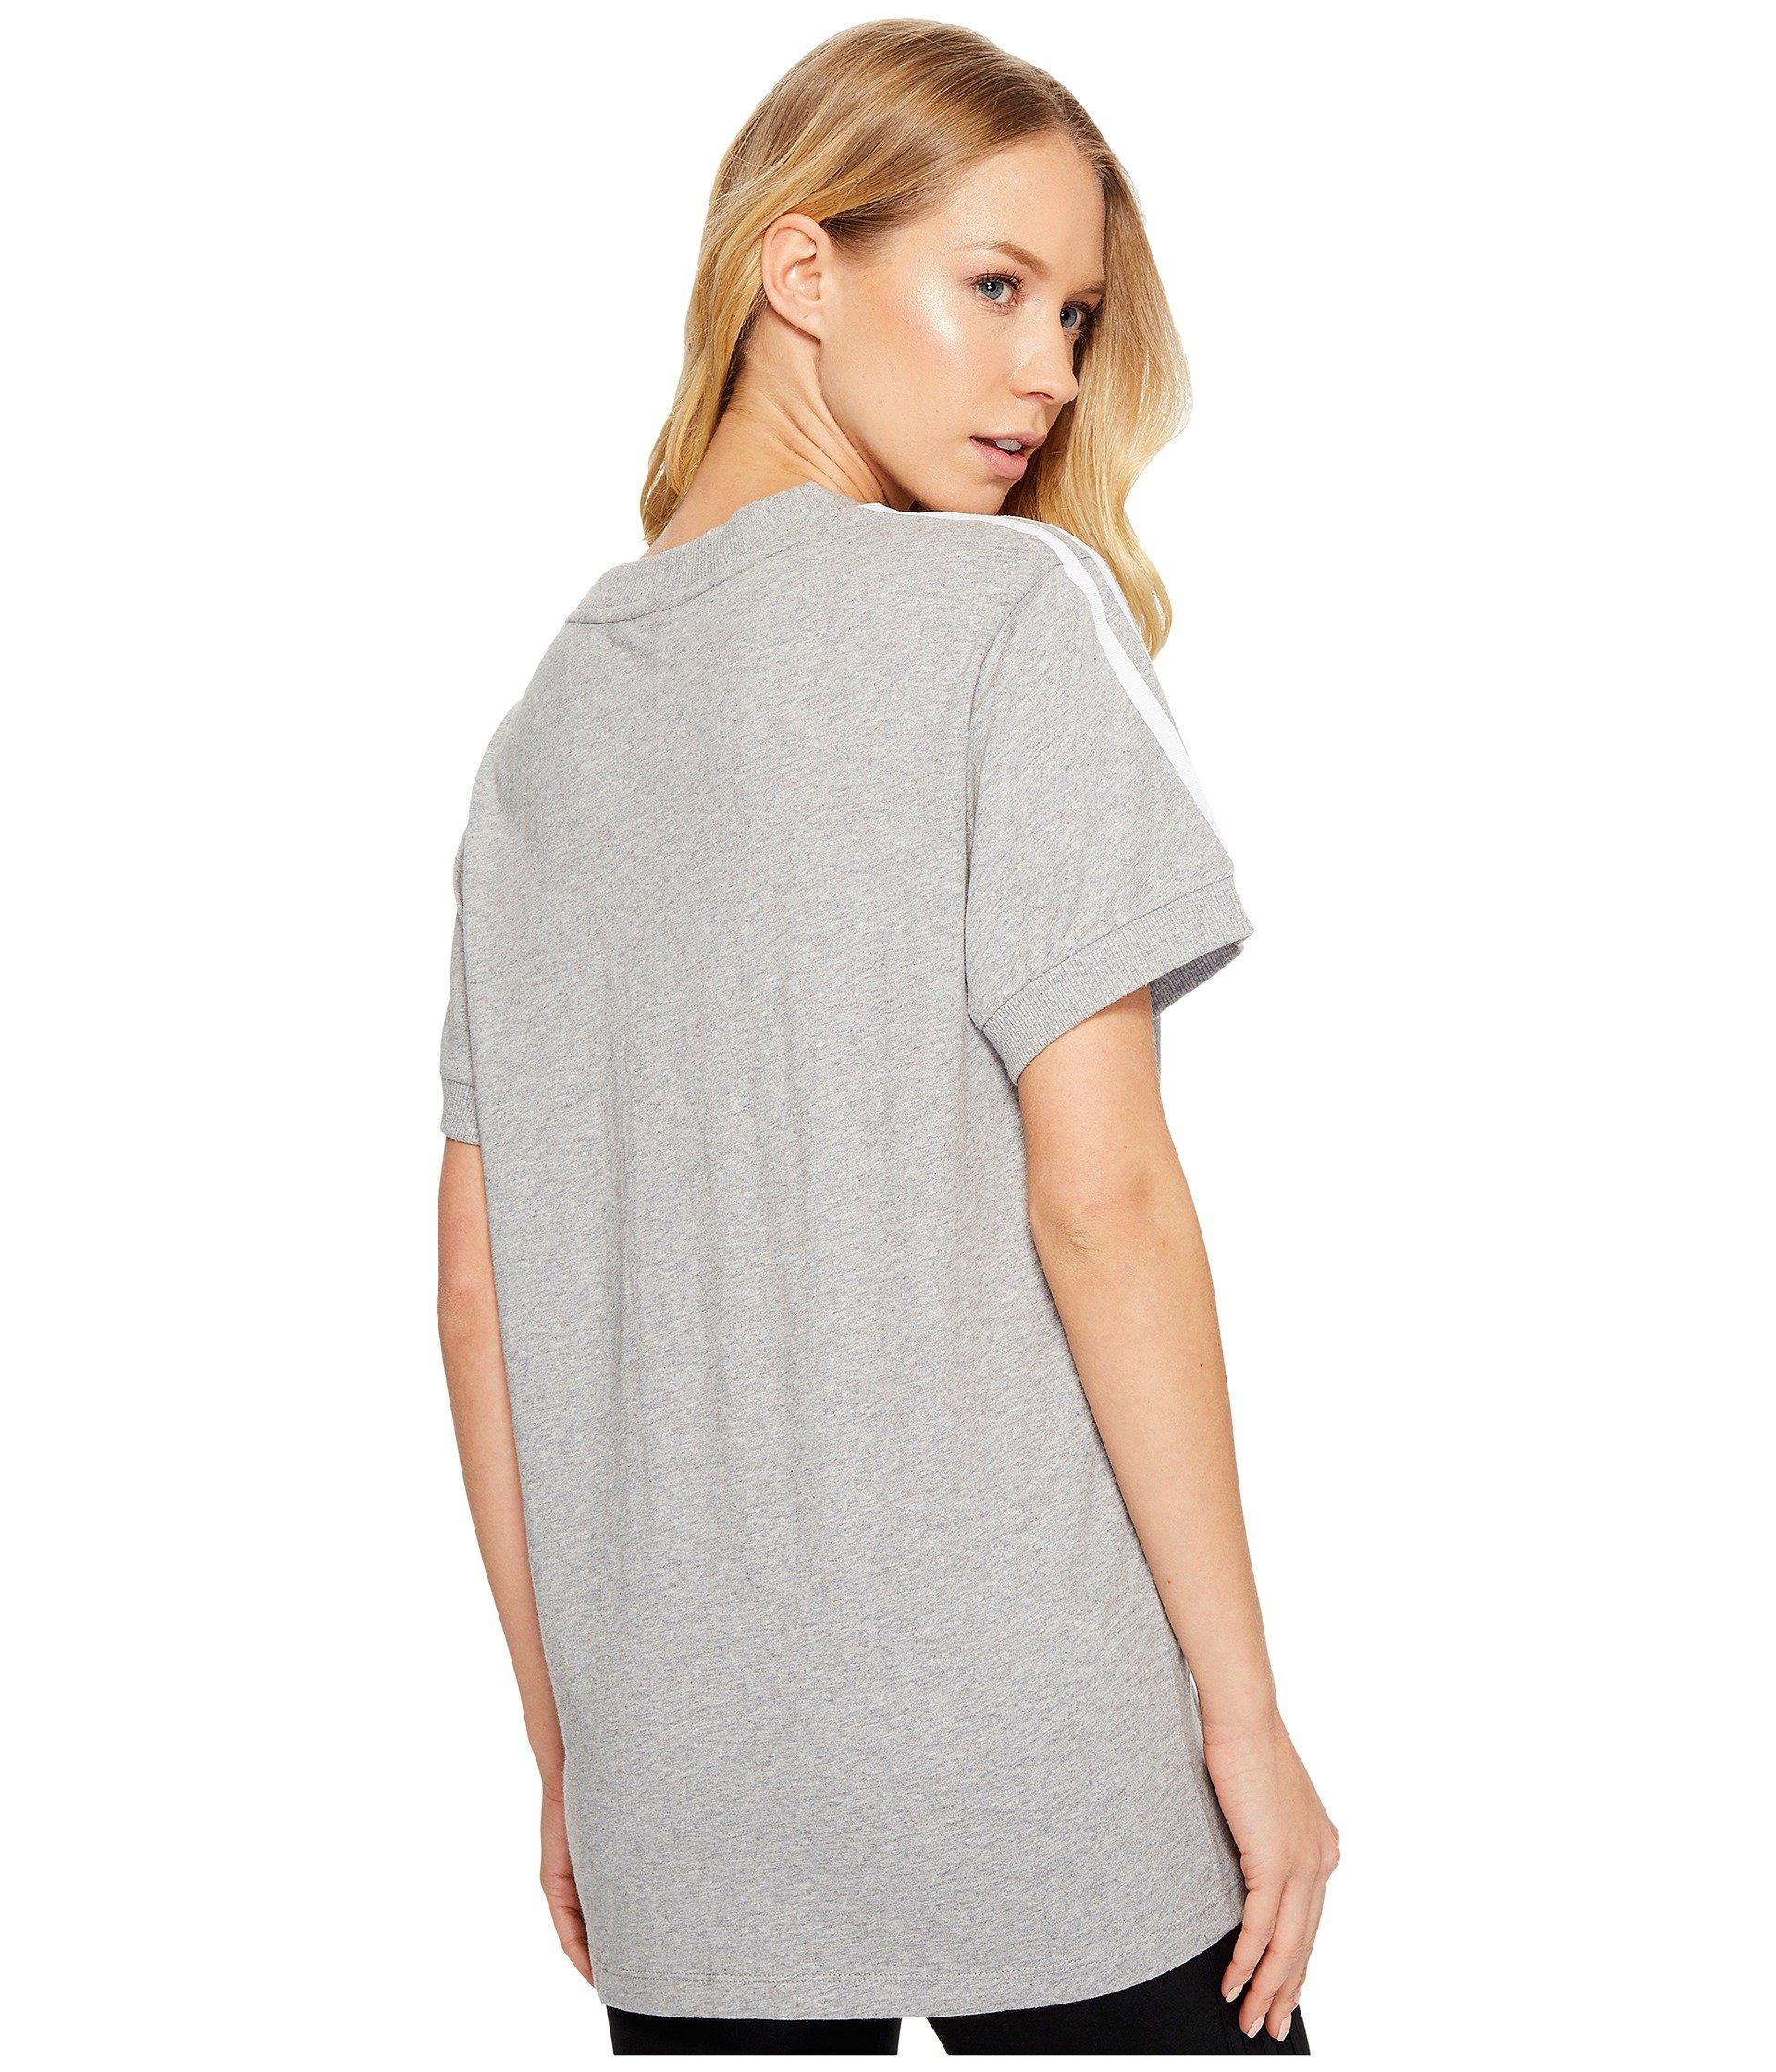 Heather Stripes 3 Tee Originals Grey Medium Adidas Y1qfw1